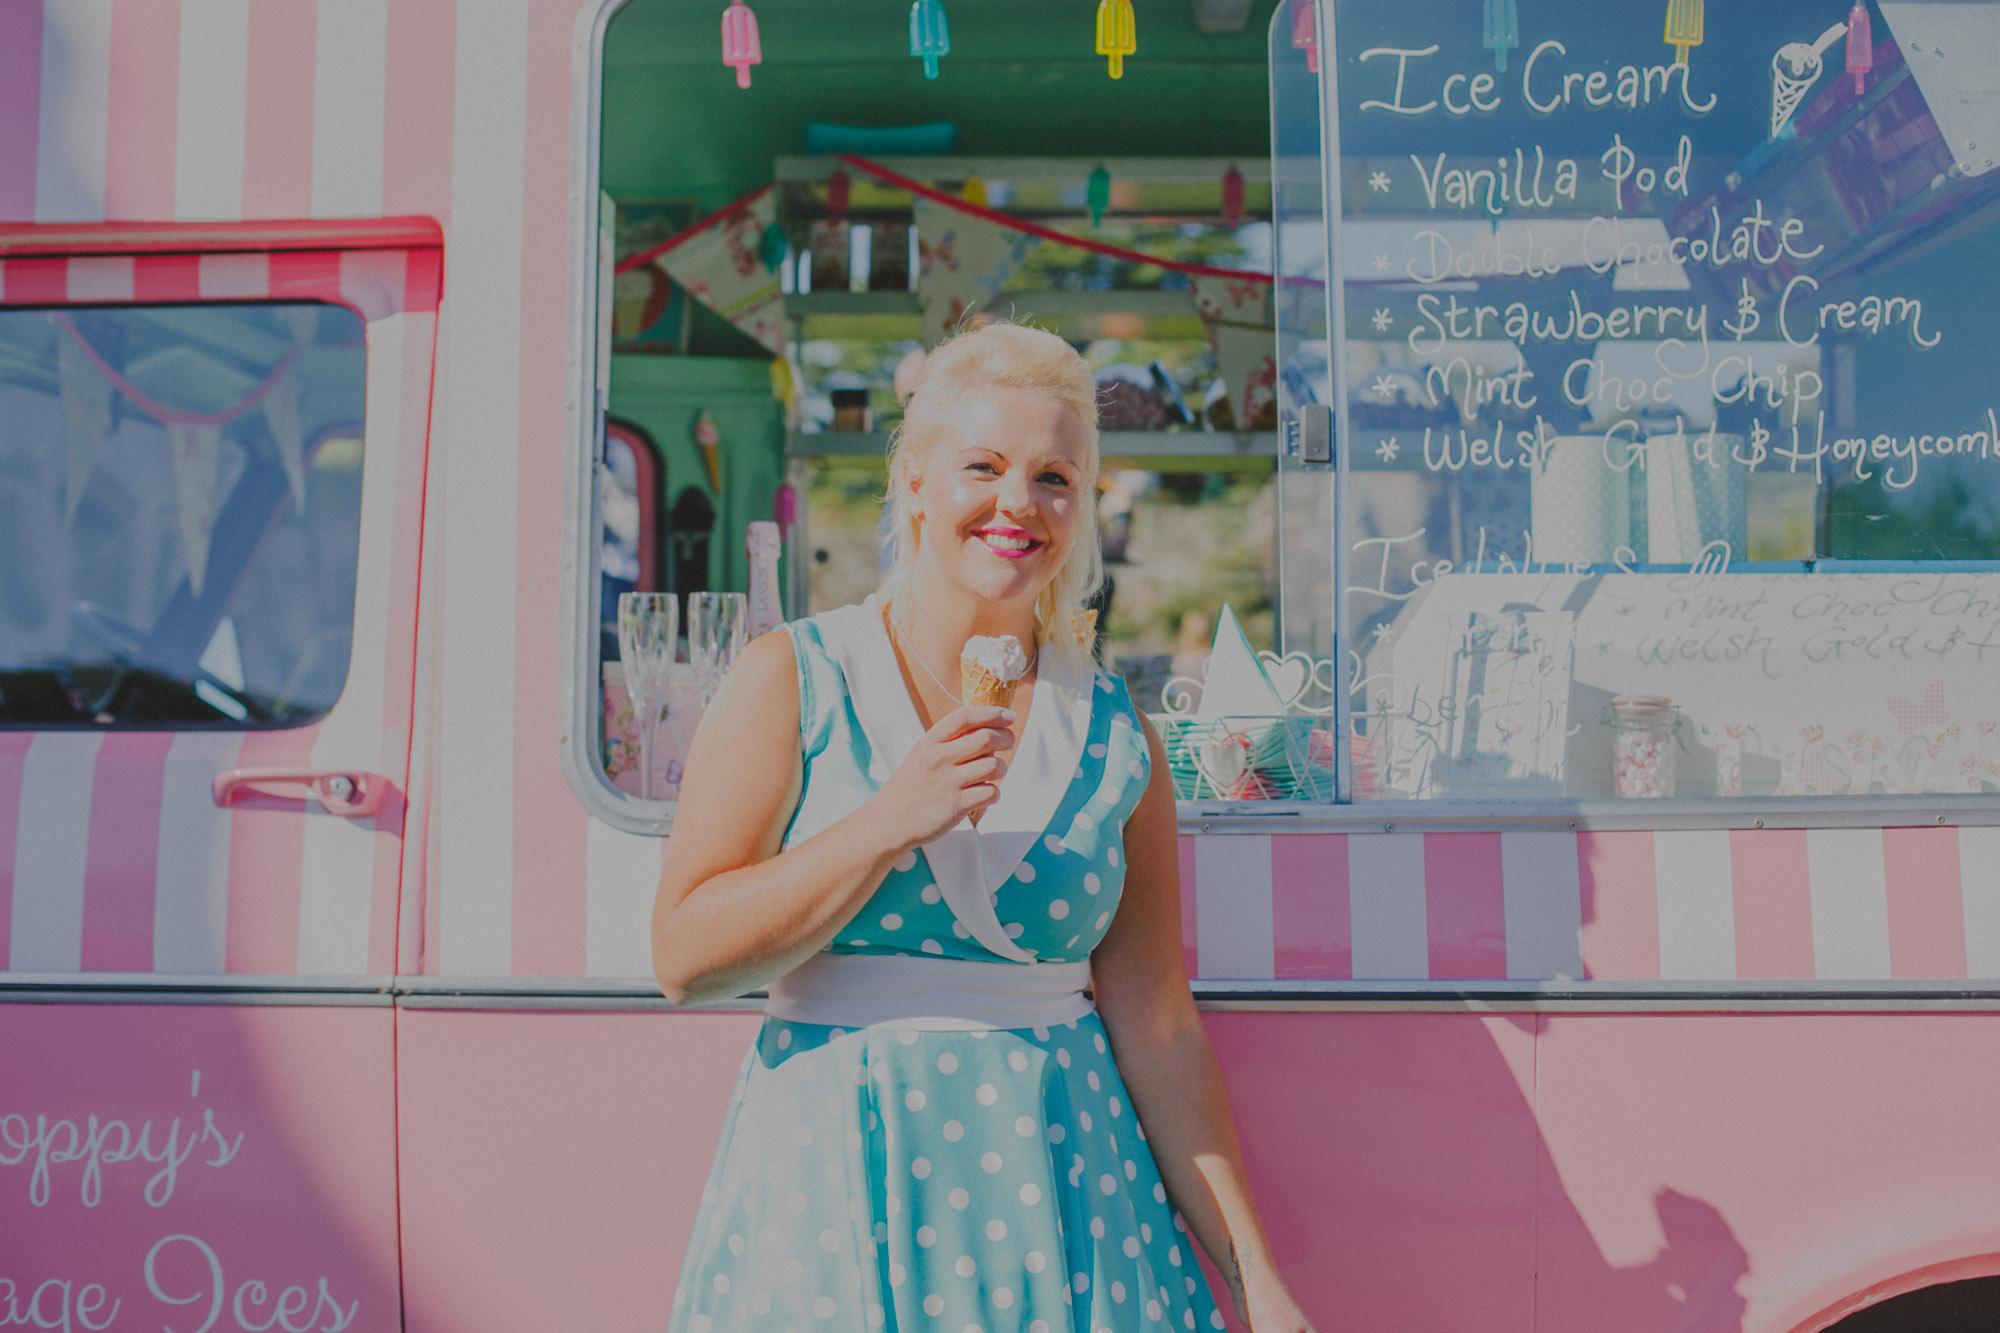 Vintage_ice_cream_South_Wales-60.jpg